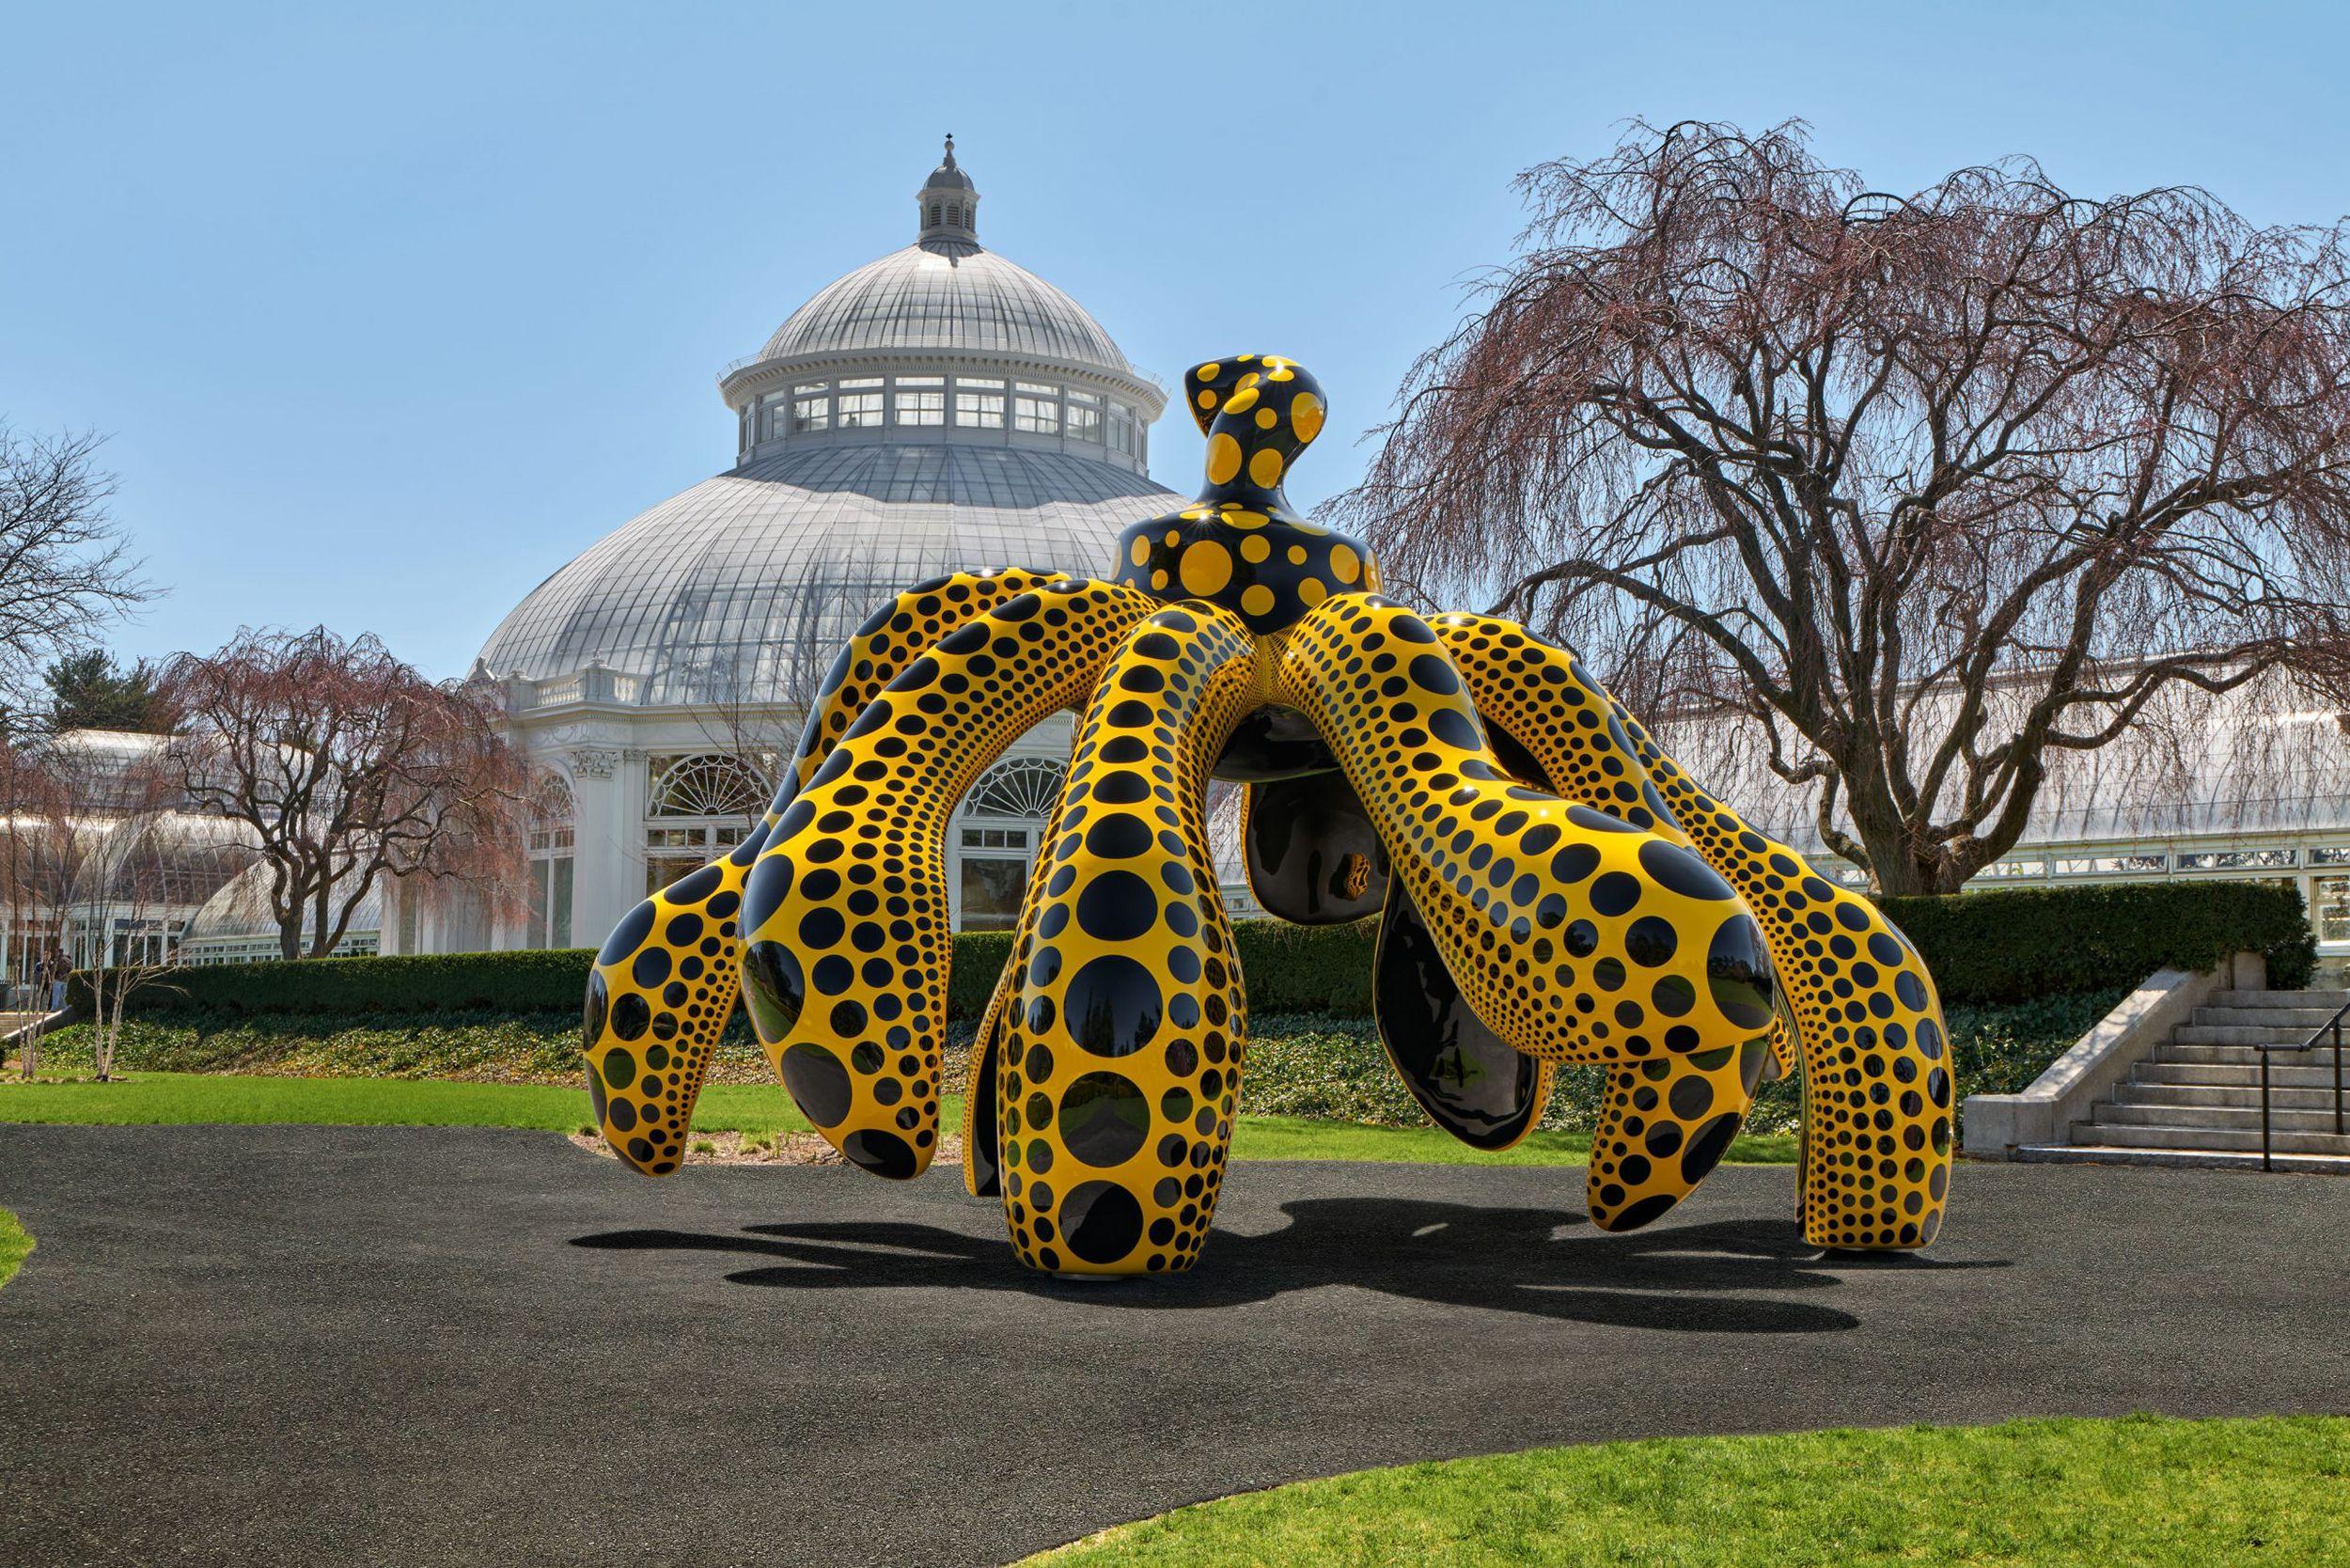 La obra de Yayoi Kusama invade el Jardín Botánico de Nueva York